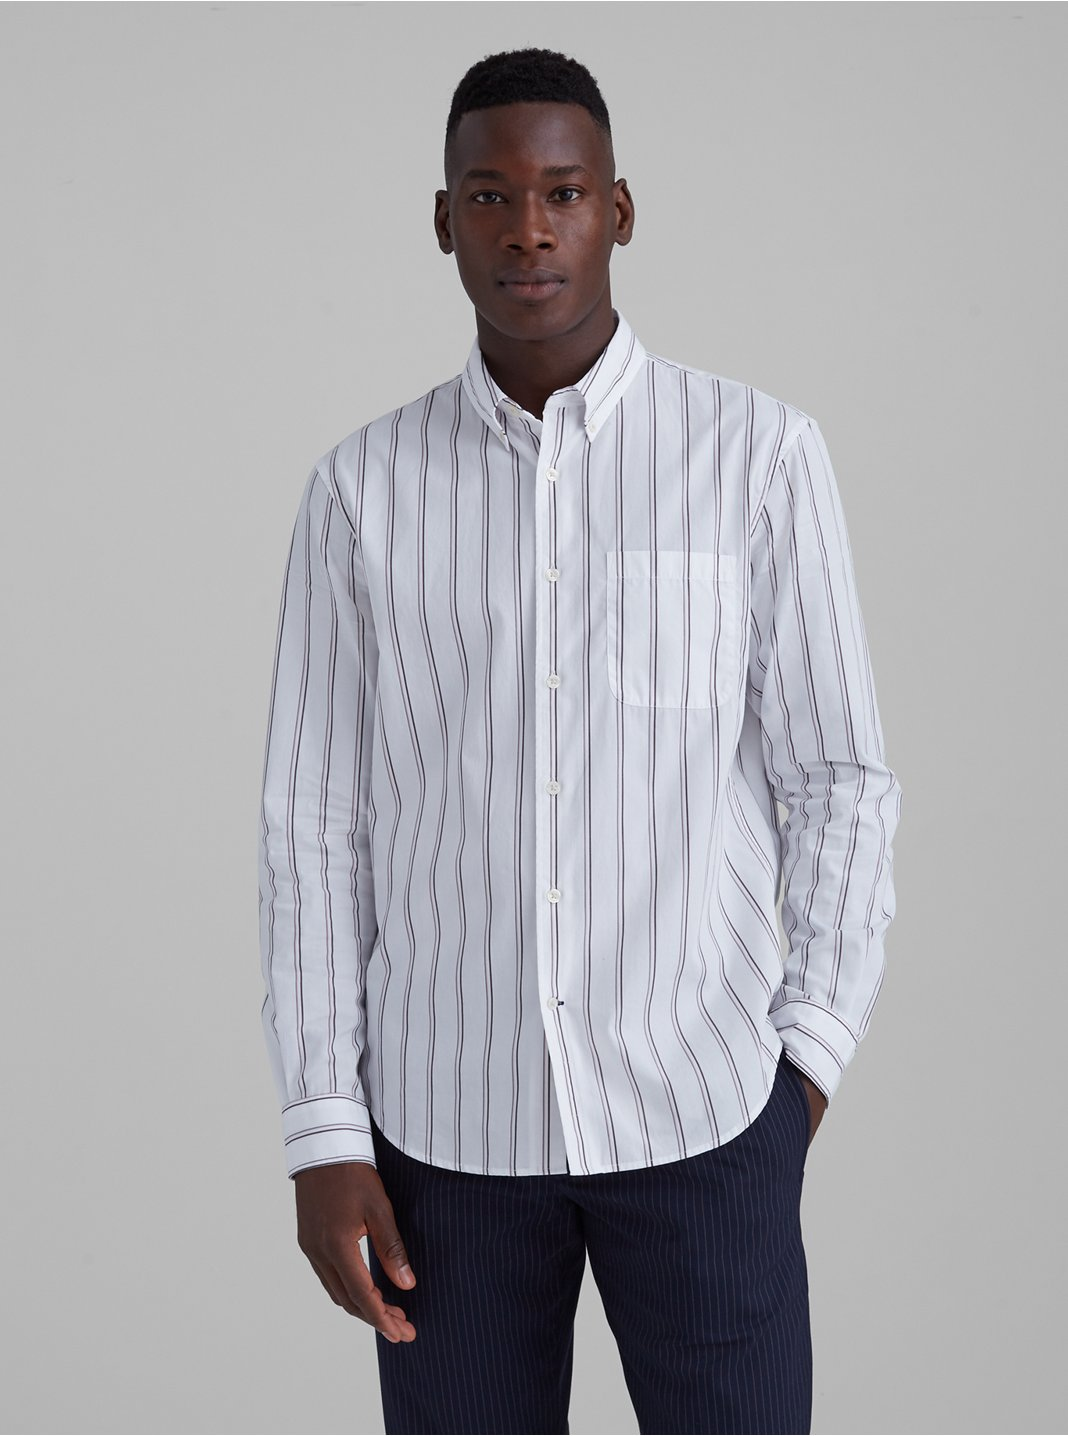 Thin Striped Shirt